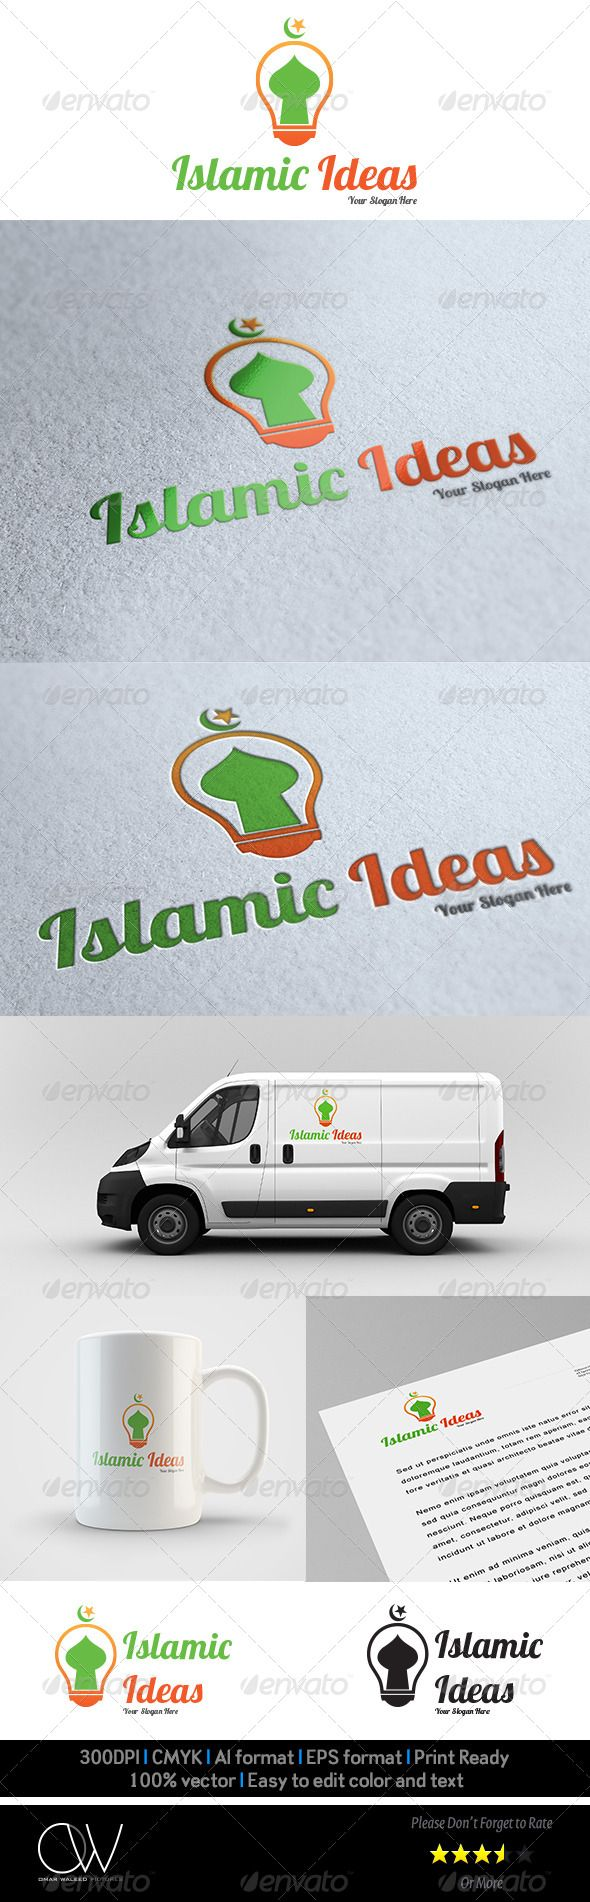 Islamic Ideas Logo Template